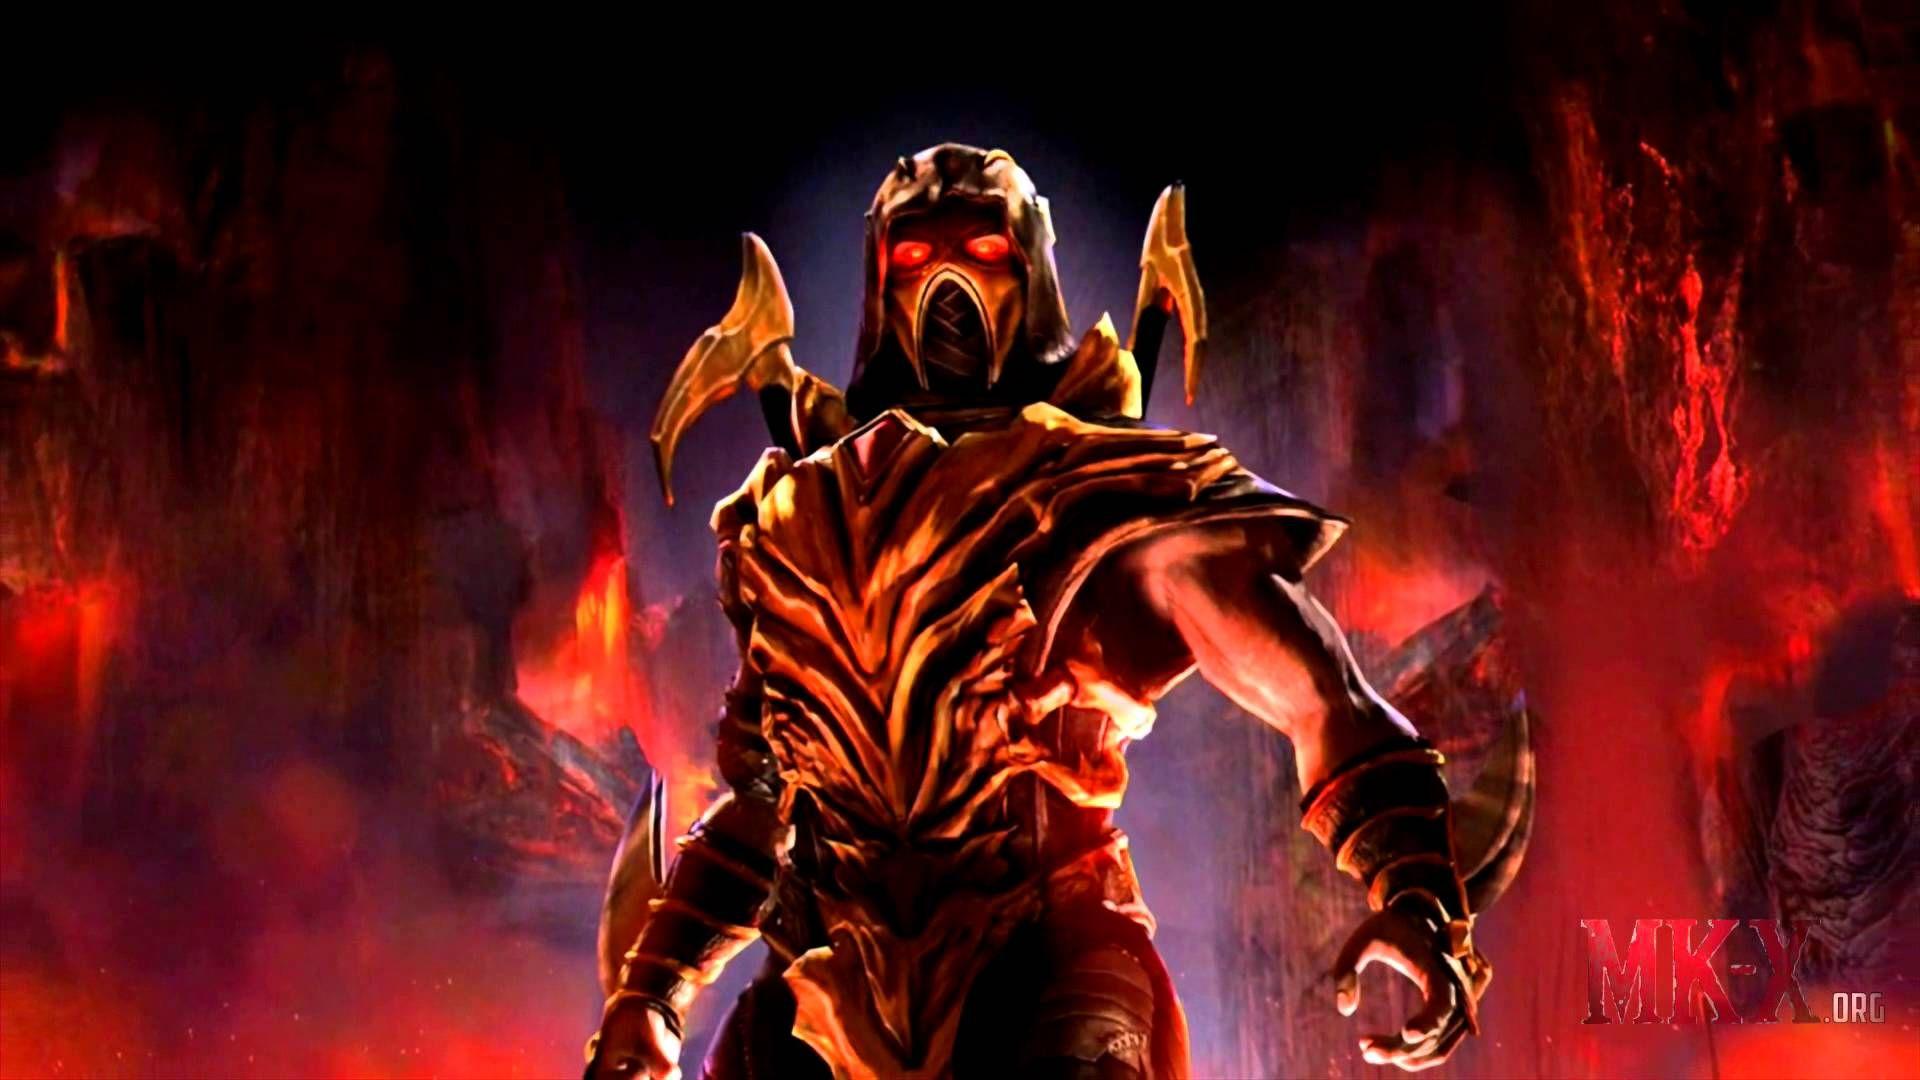 Laser background galleryhip com the hippest galleries - Ultra Hd K Mortal Kombat X Wallpapers Hd Desktop Backgrounds 640 960 Scorpion Wallpaper